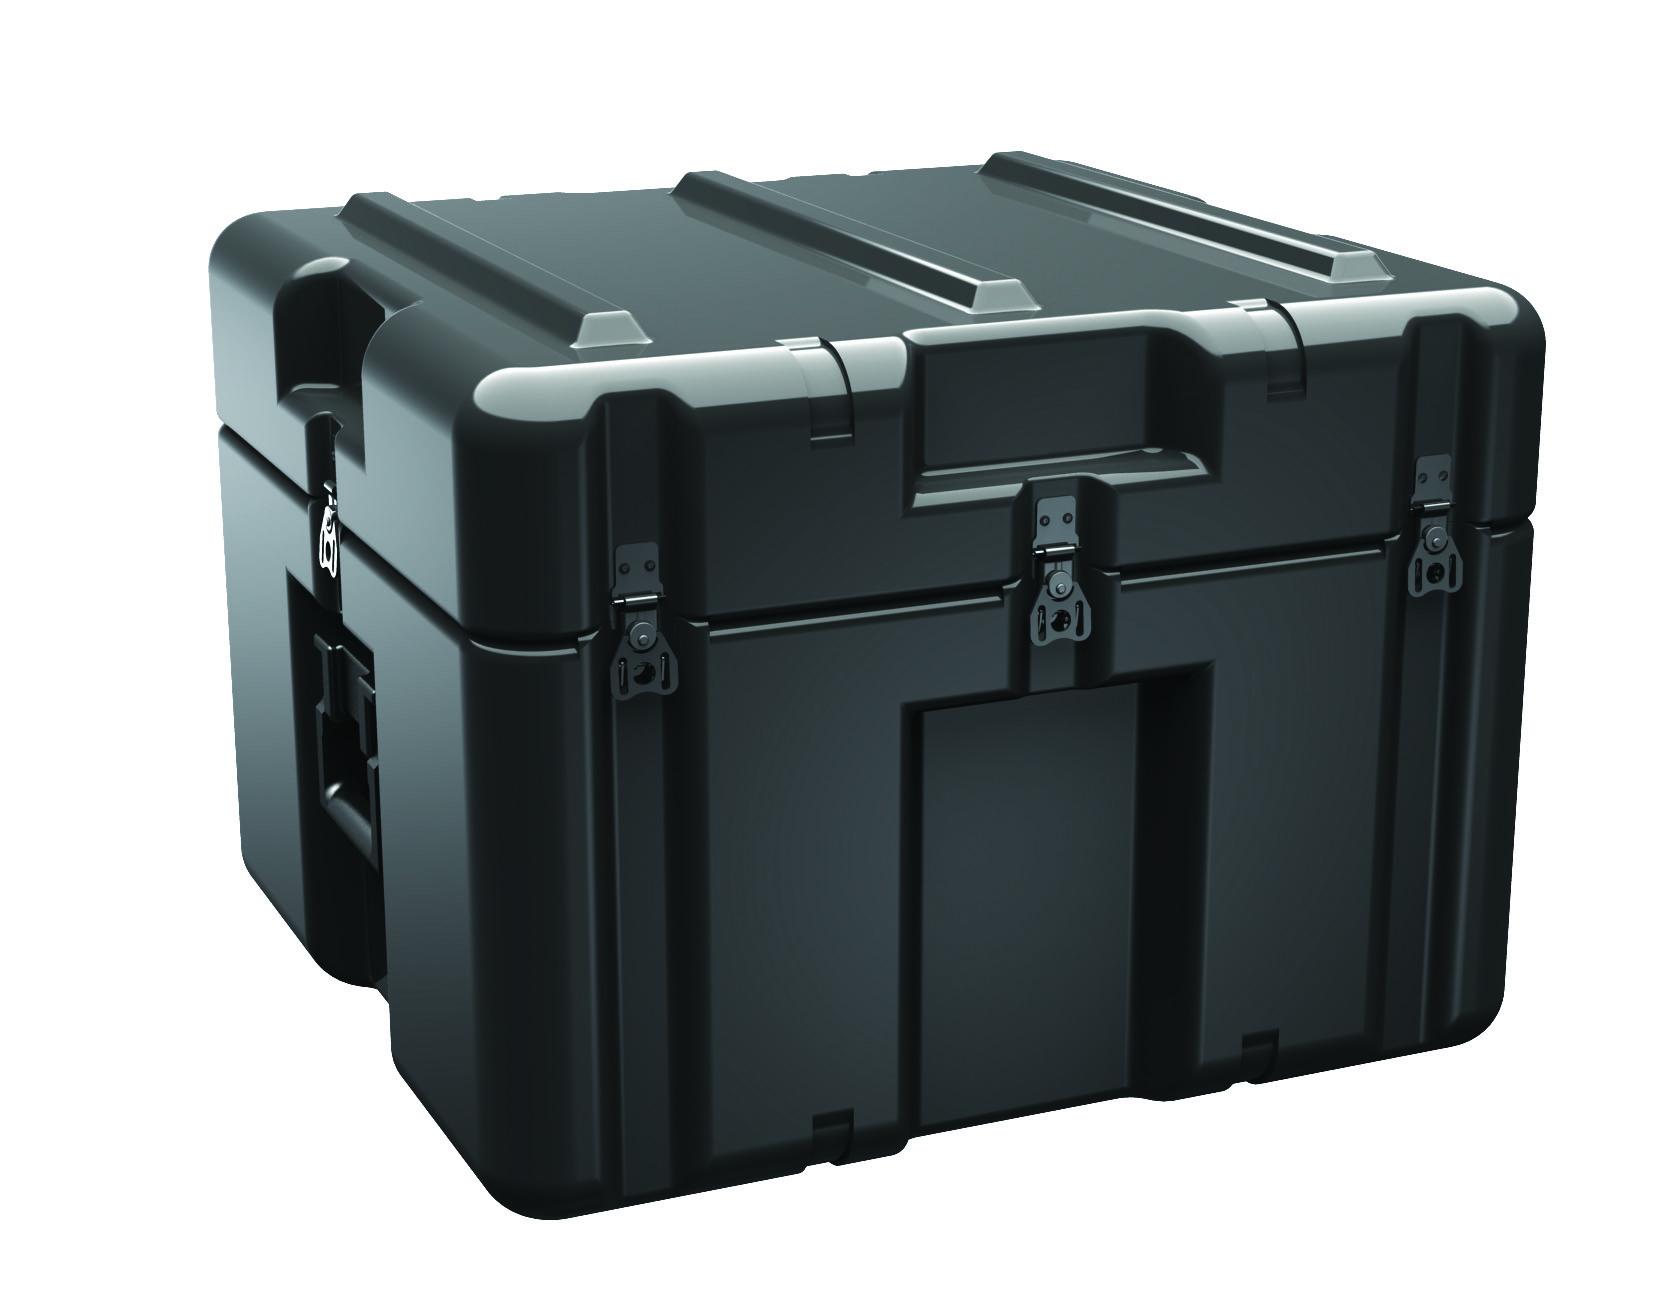 AL2221-1205 - AL2221-1205 Hinged Single Lid Pelican Cube Case